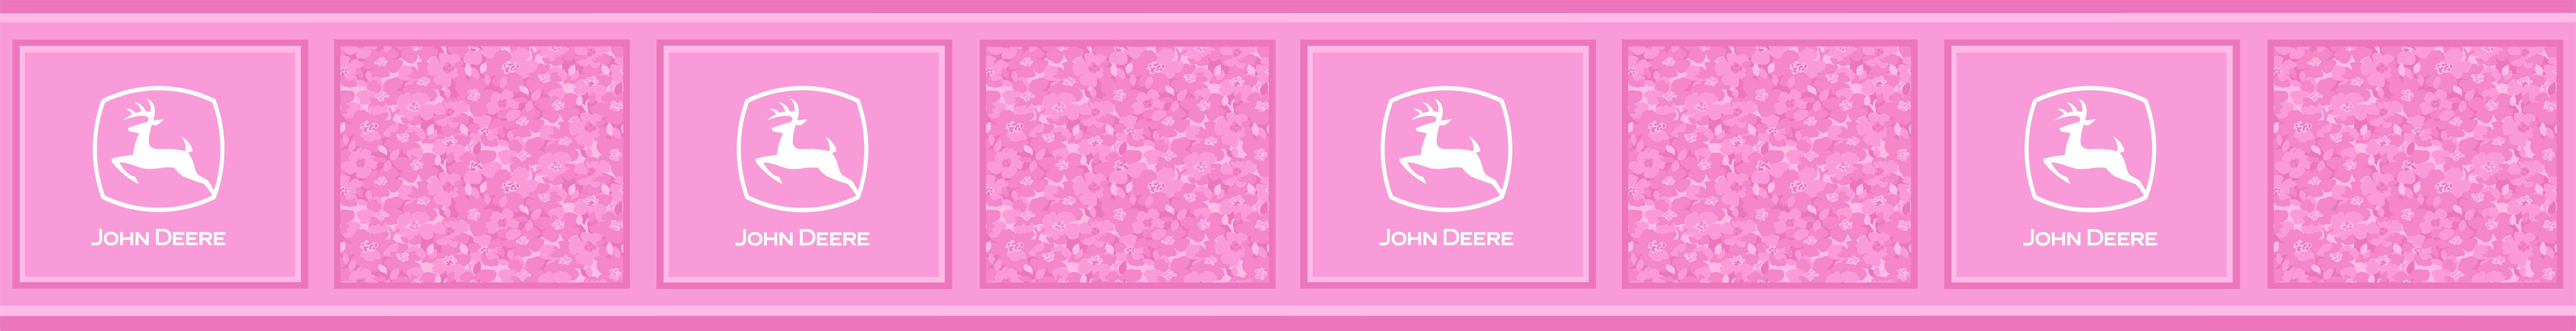 greencrazycomJohn Deere Pink Floral Camo 7200x924